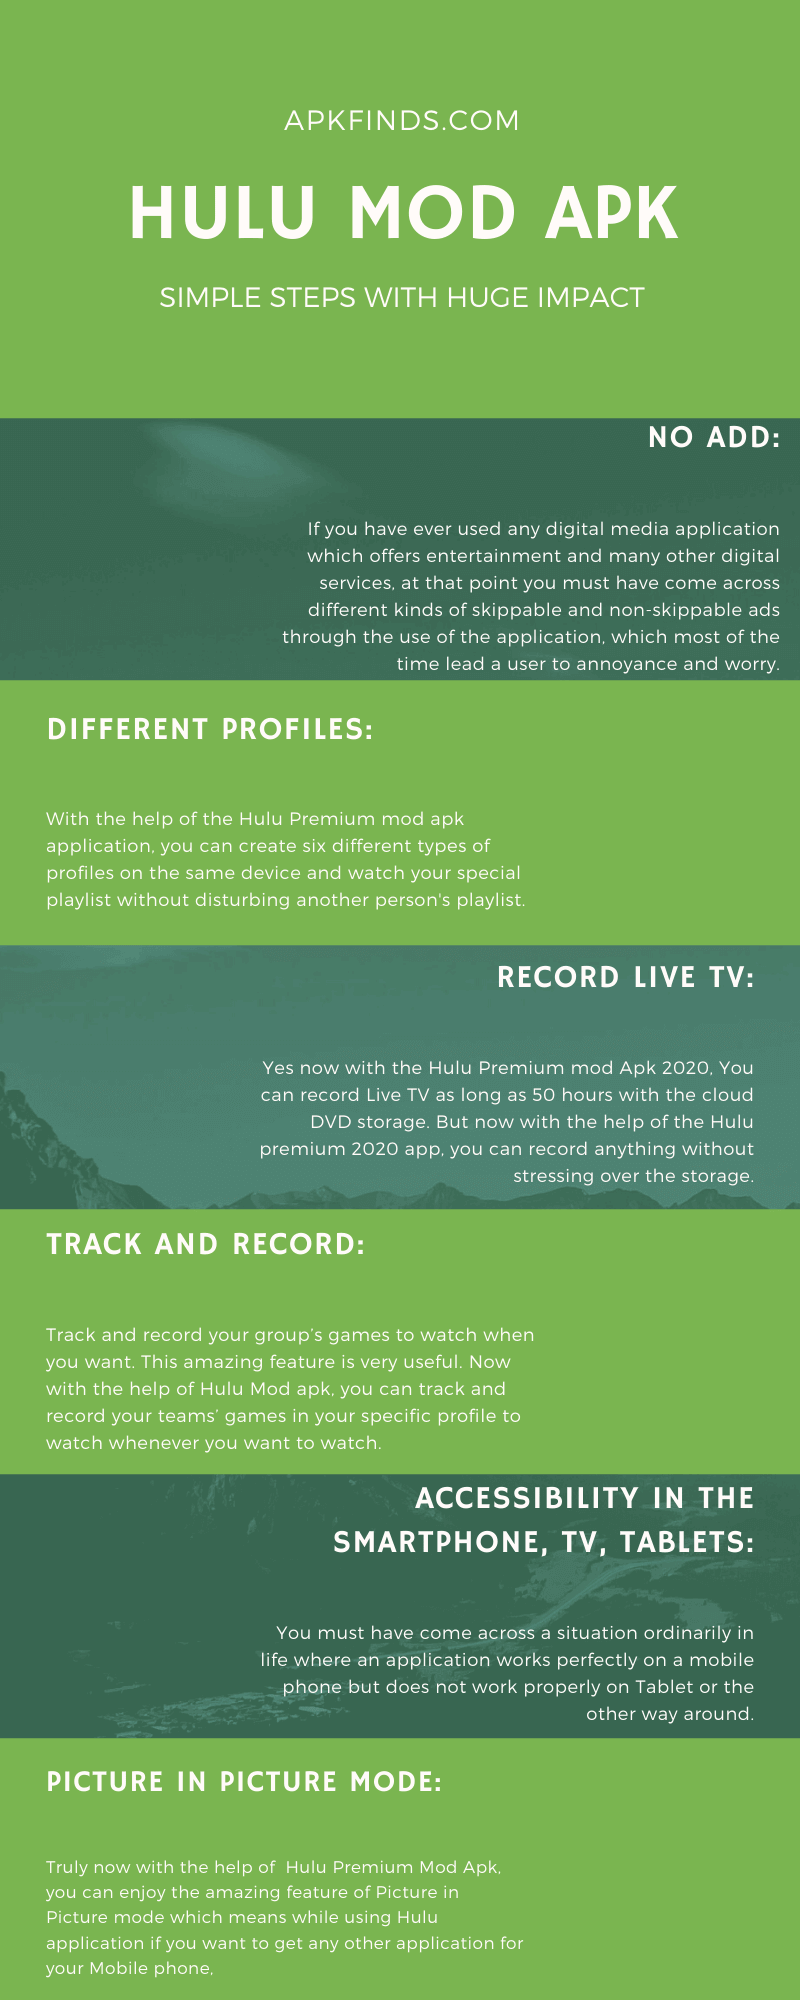 hulu mod apk infographics